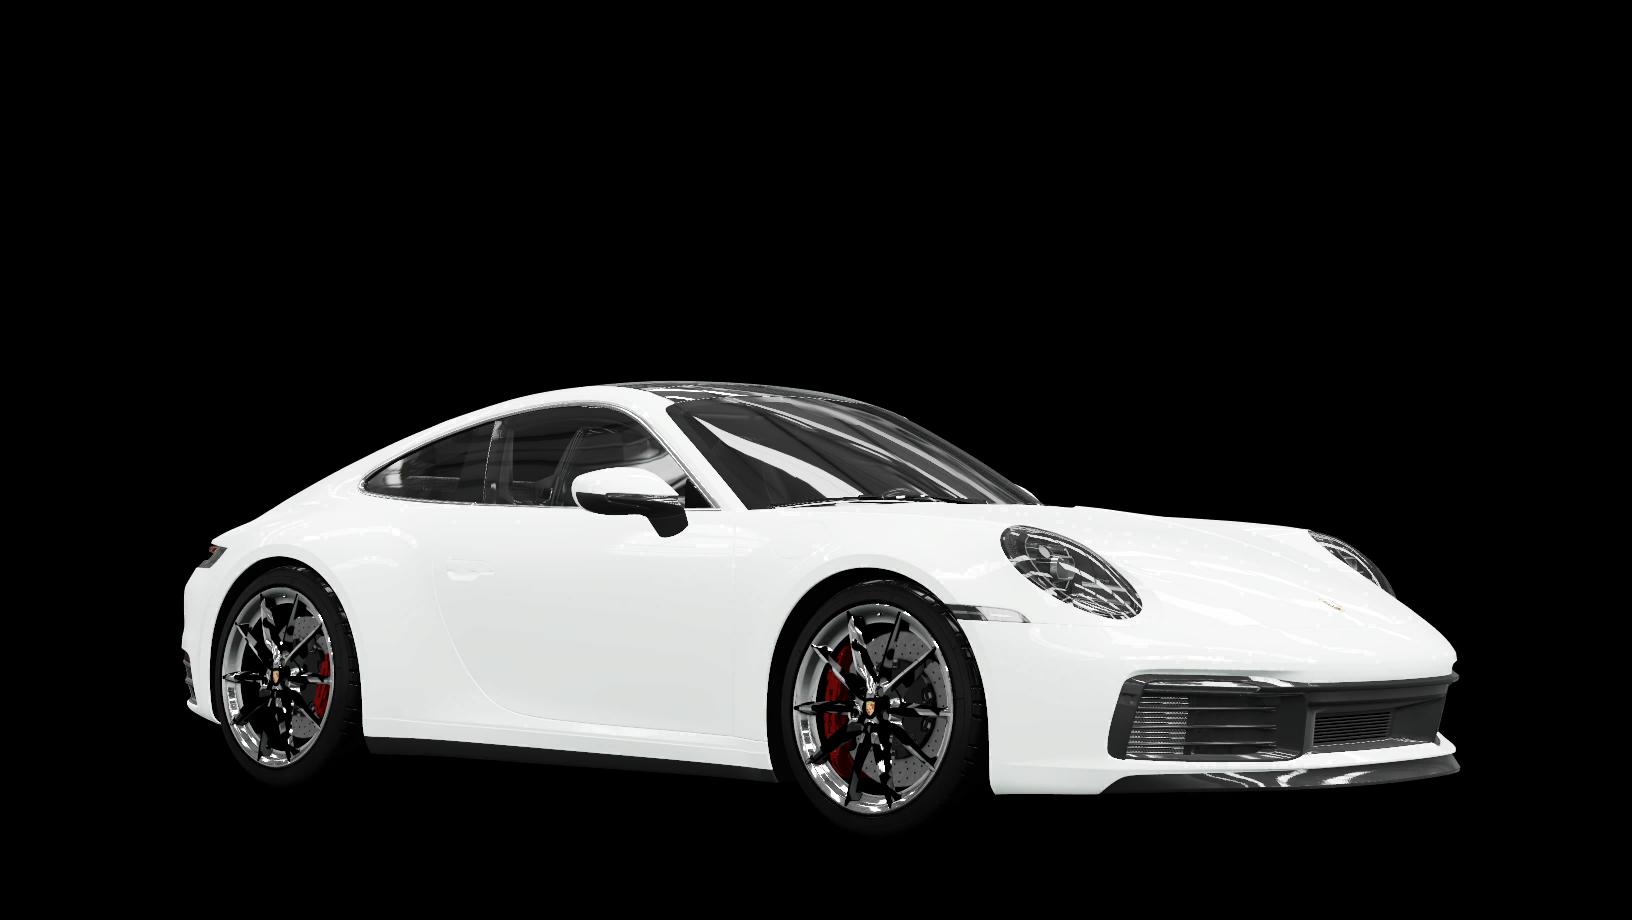 Porsche 911 Carrera S Forza Wiki Fandom